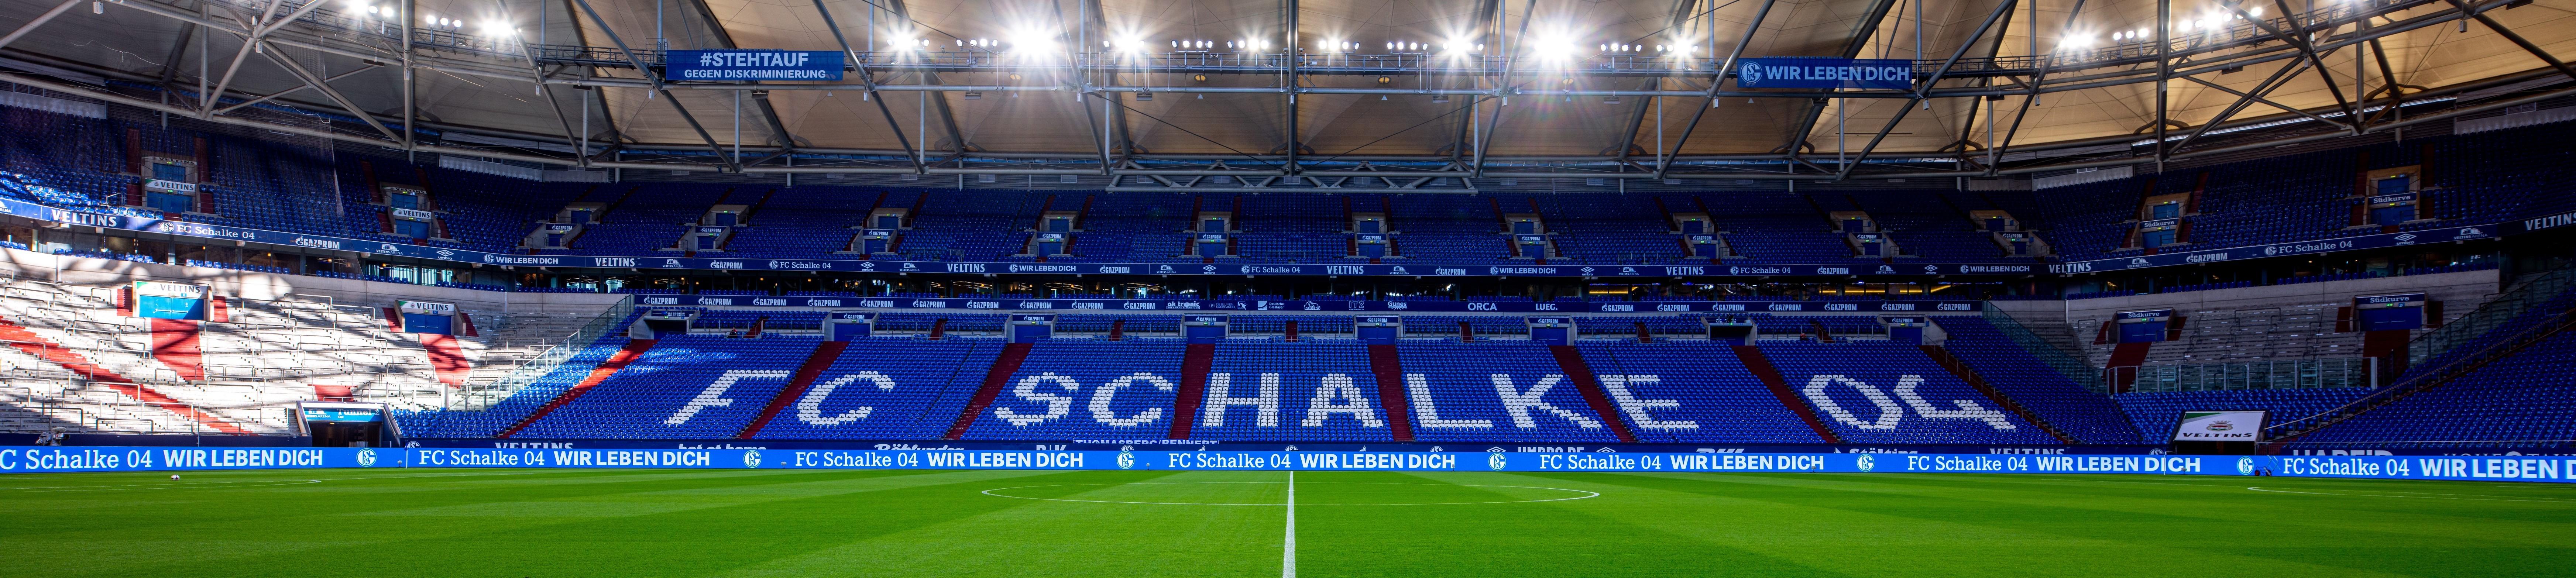 Fc Schalke 04 Linkedin